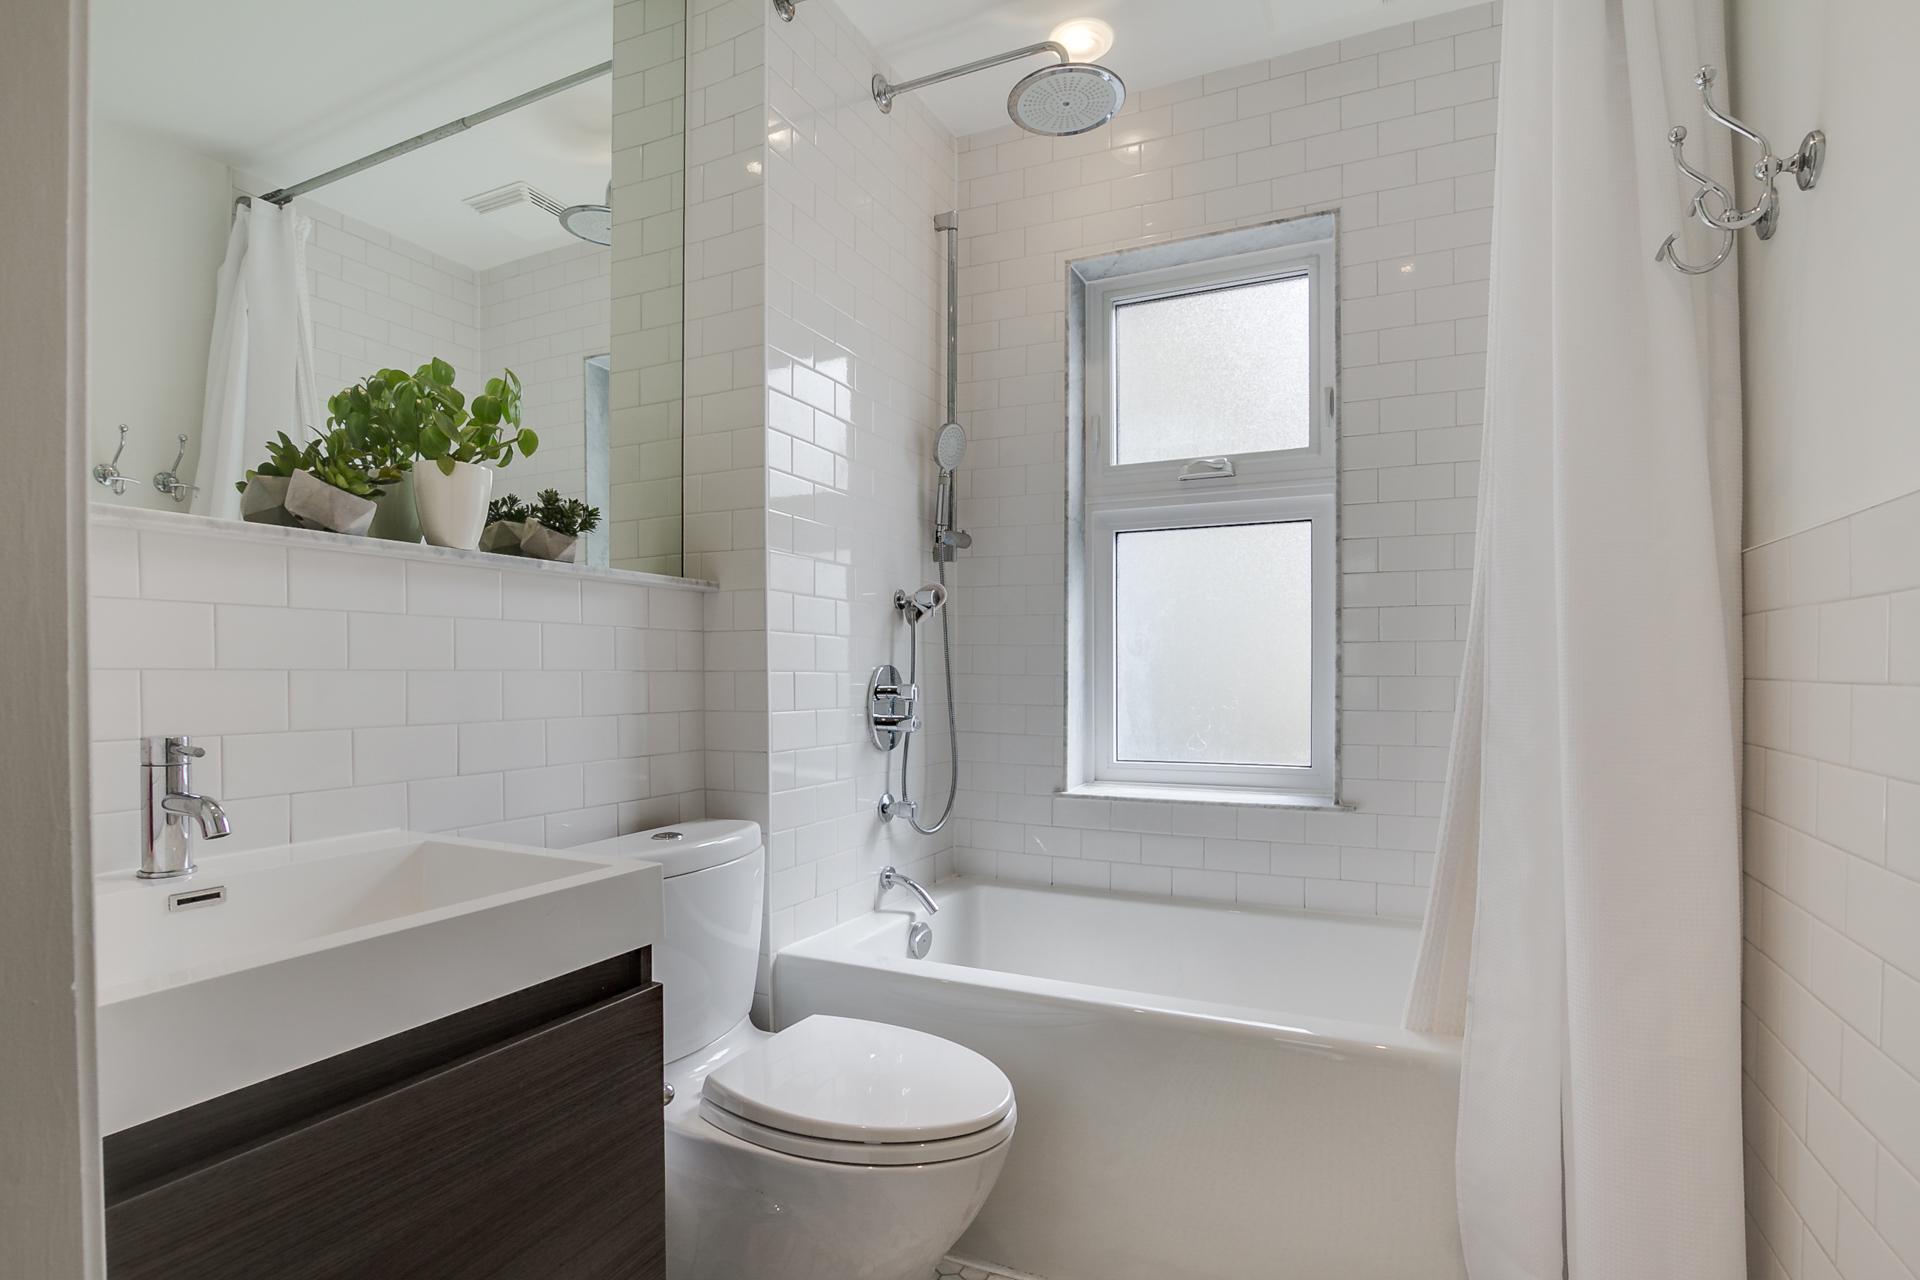 37_bathroom1.jpg